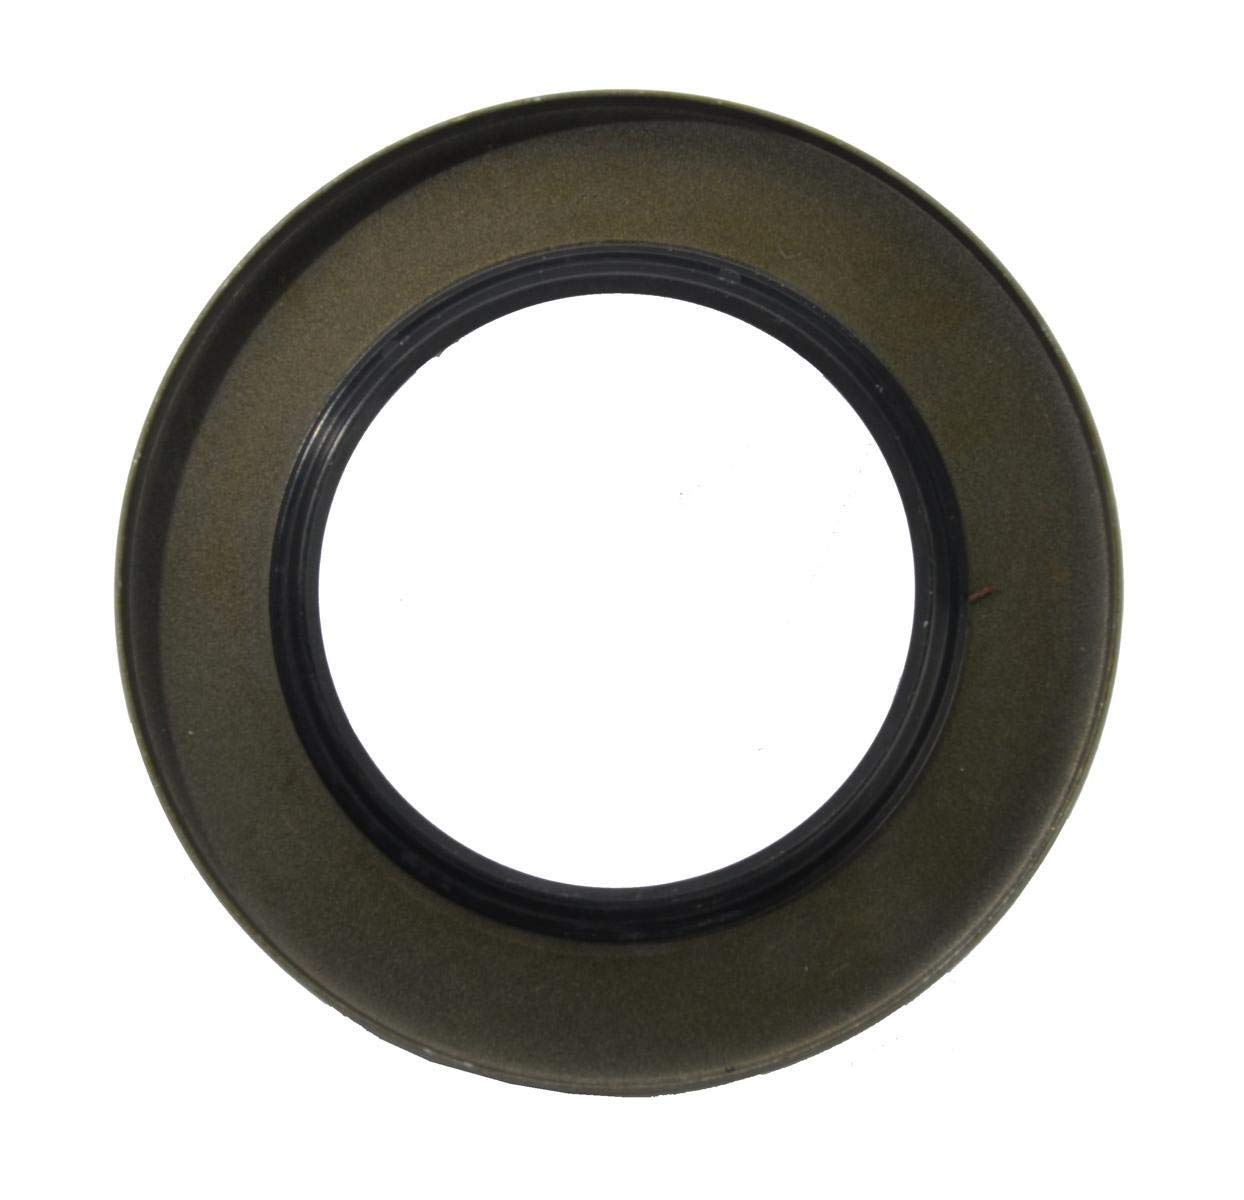 85,0x105,0x10,0 mm Bauform AS ToolNerds Radial Wellendichtring NBR 72A Profil